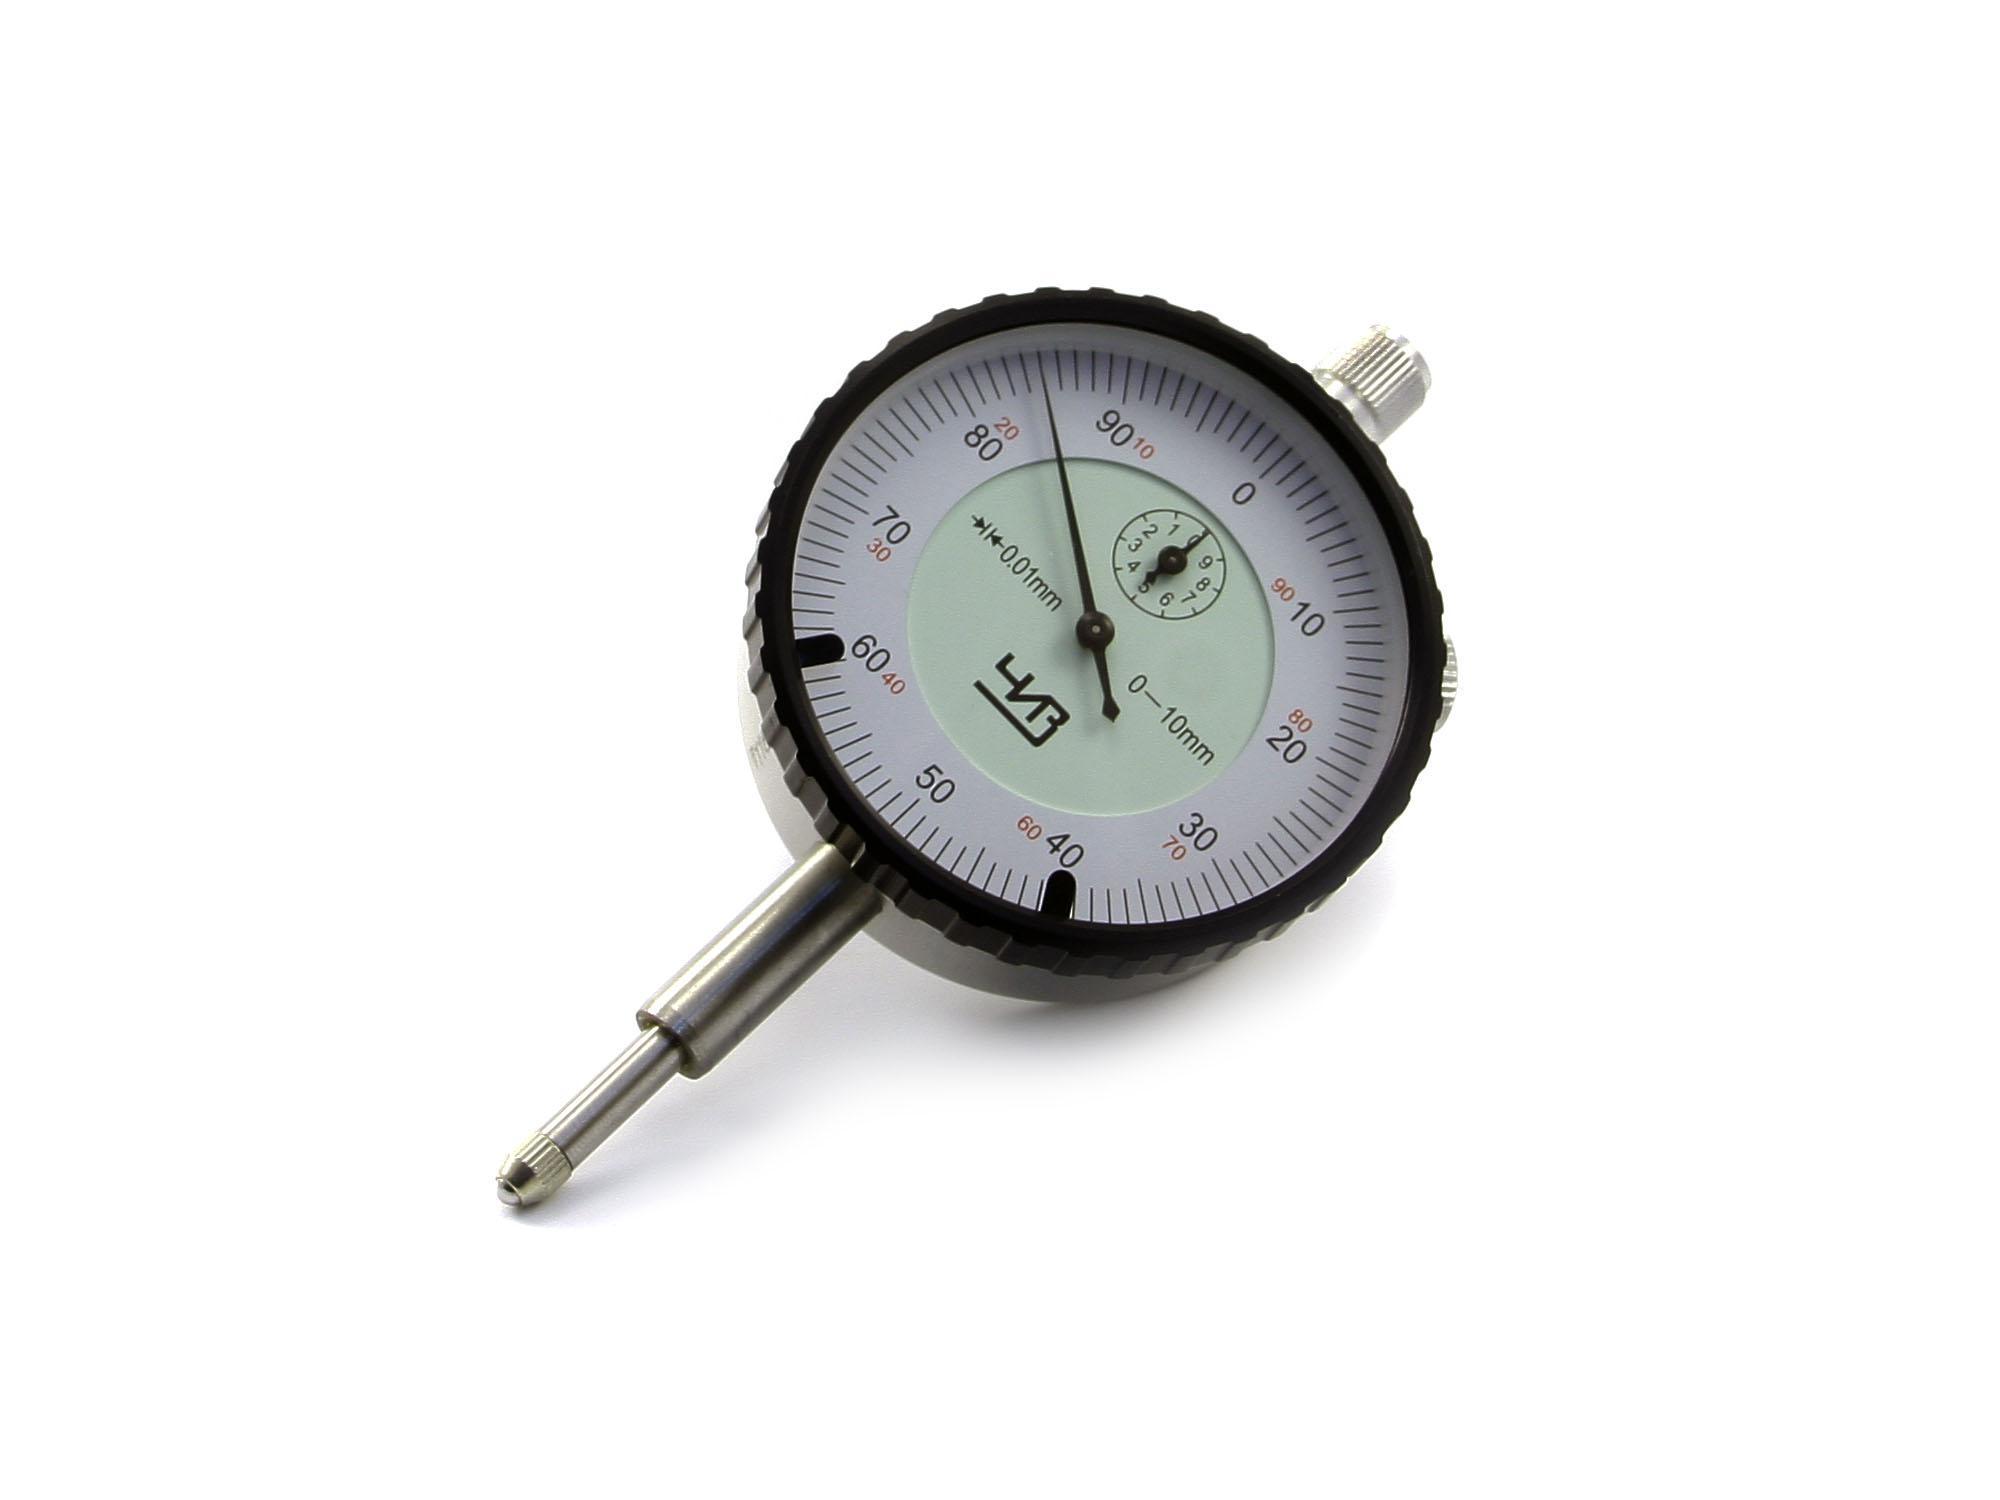 Индикатор ЧИЗ час.типа 0-25 0.01 с уш.